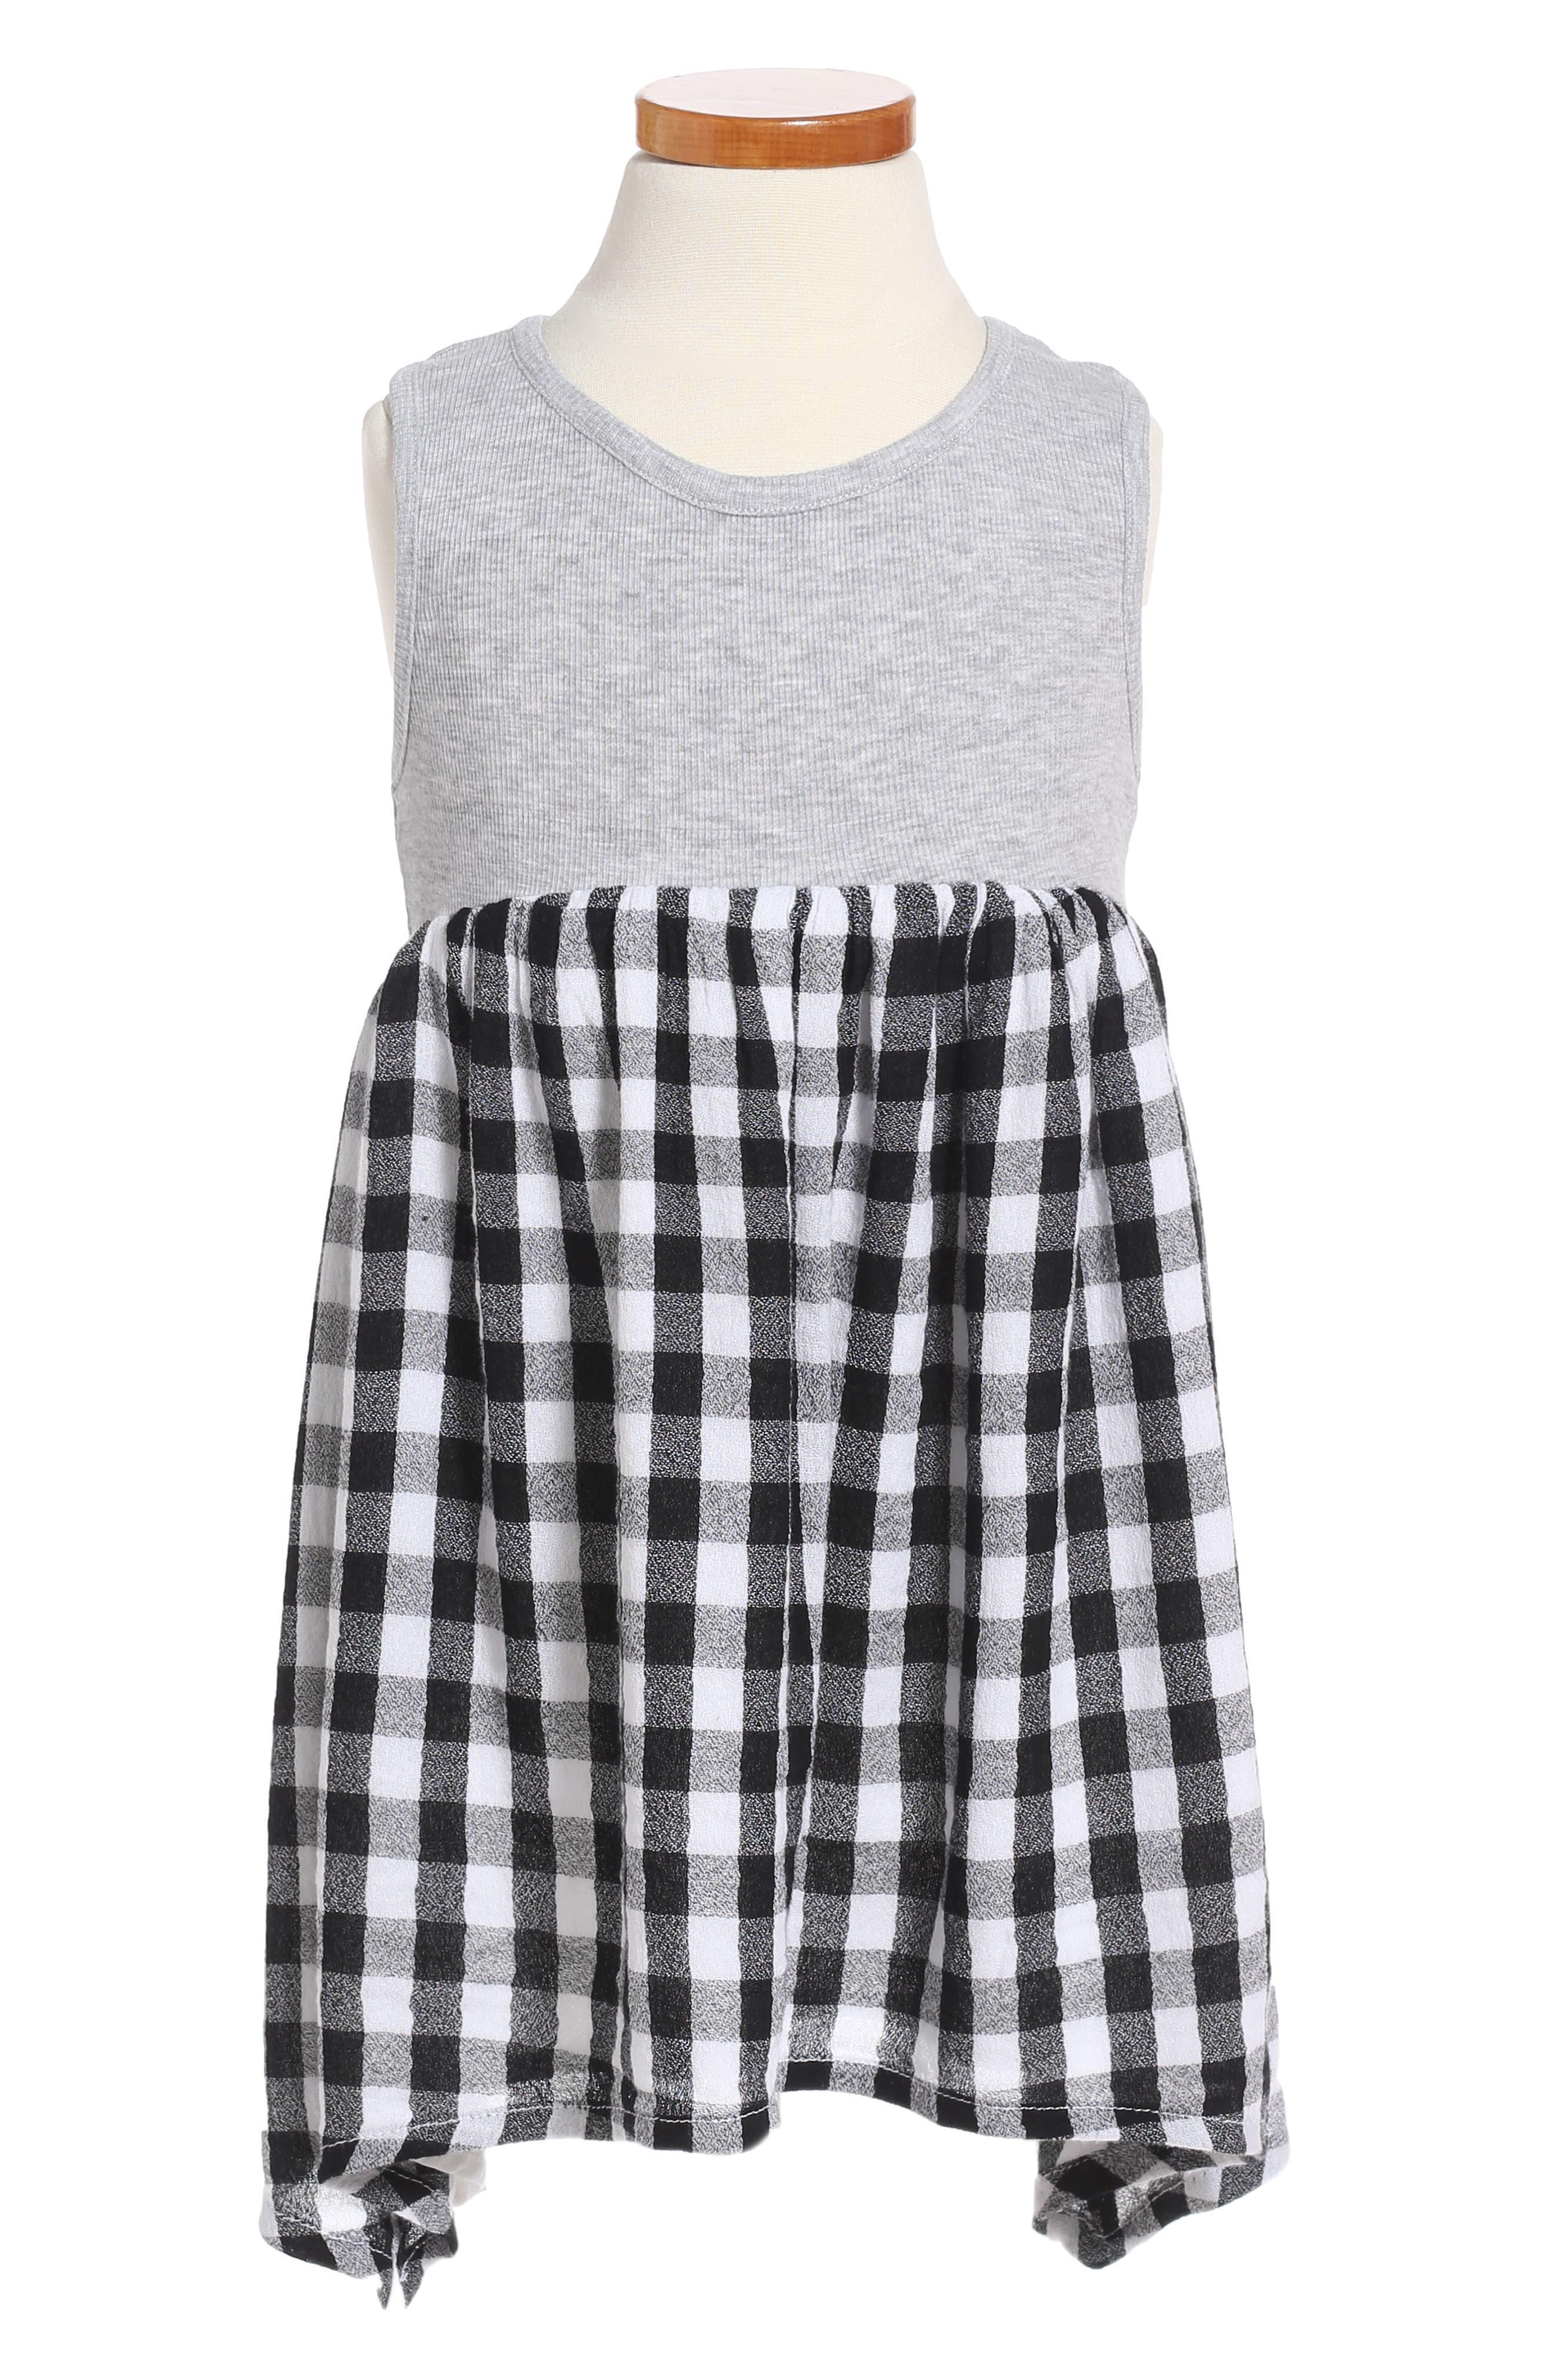 Alternate Image 1 Selected - Tucker + Tate Mixed Media Dress (Toddler Girls, Little Girls & Big Girls)